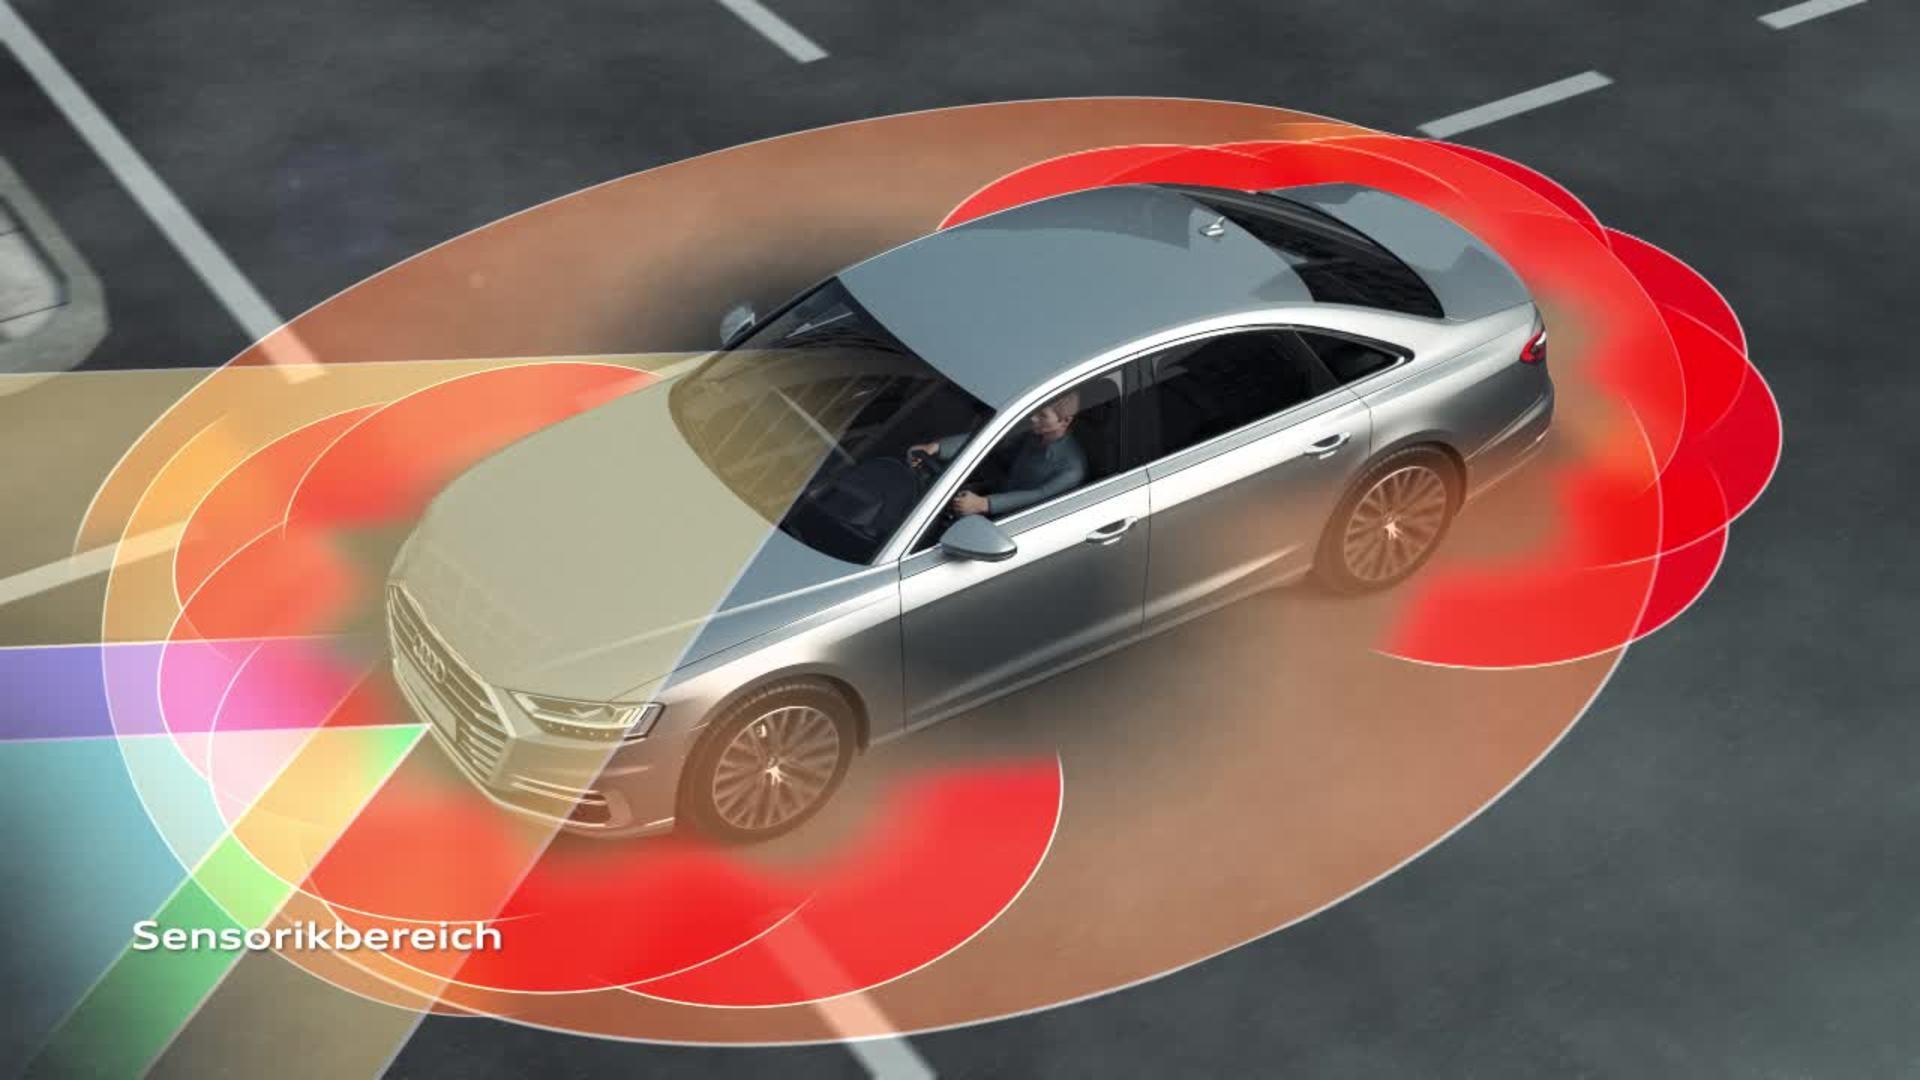 Animation Audi A8 - Audi AI traffic jam pilot